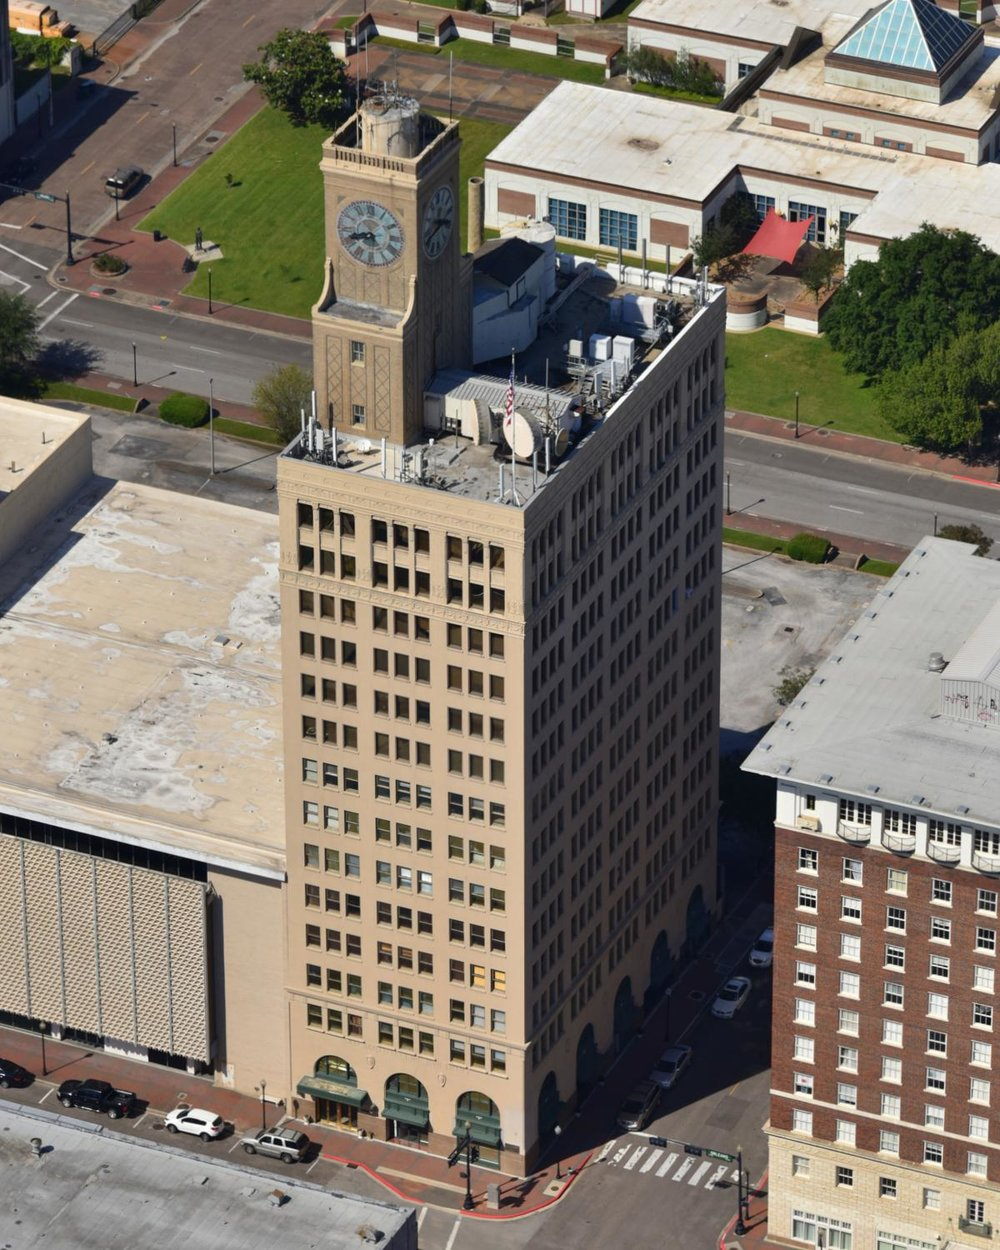 San Jacinto Life Building, Beaumont, Texas - Beaumont Aerial Photographer - Port Arthur Aerial Drone Image - Orange Aerial Drone Video - Beaumont, TX - East Texas